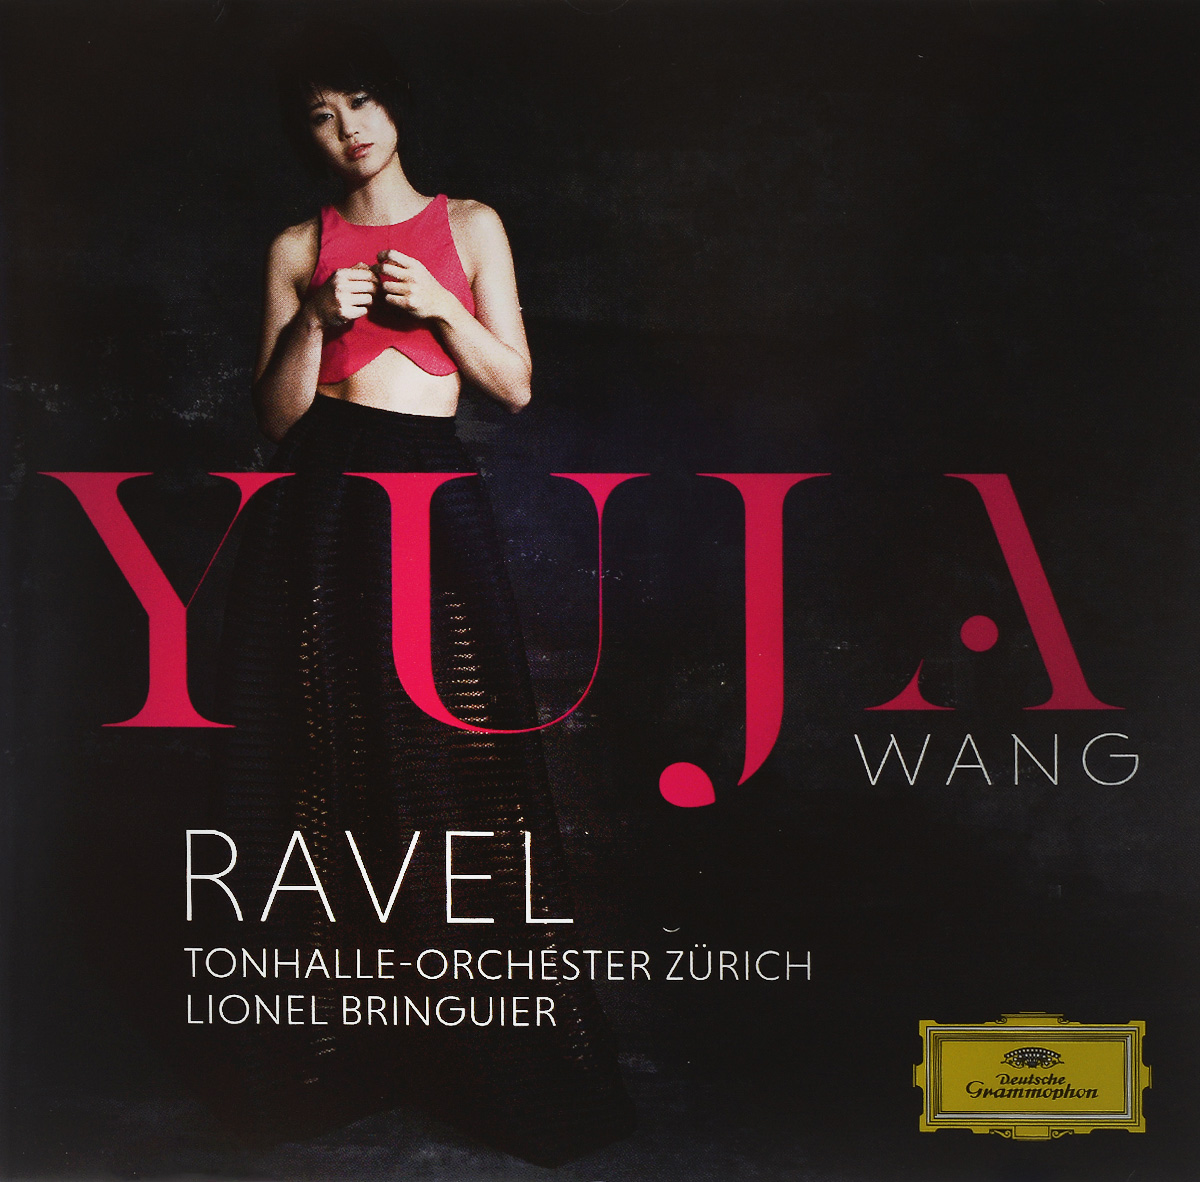 Ван Юйцзя,Tonhalle-Orchester Zurich,Лионель Бренгье Yuja Wang. Ravel yuja wang fantasia